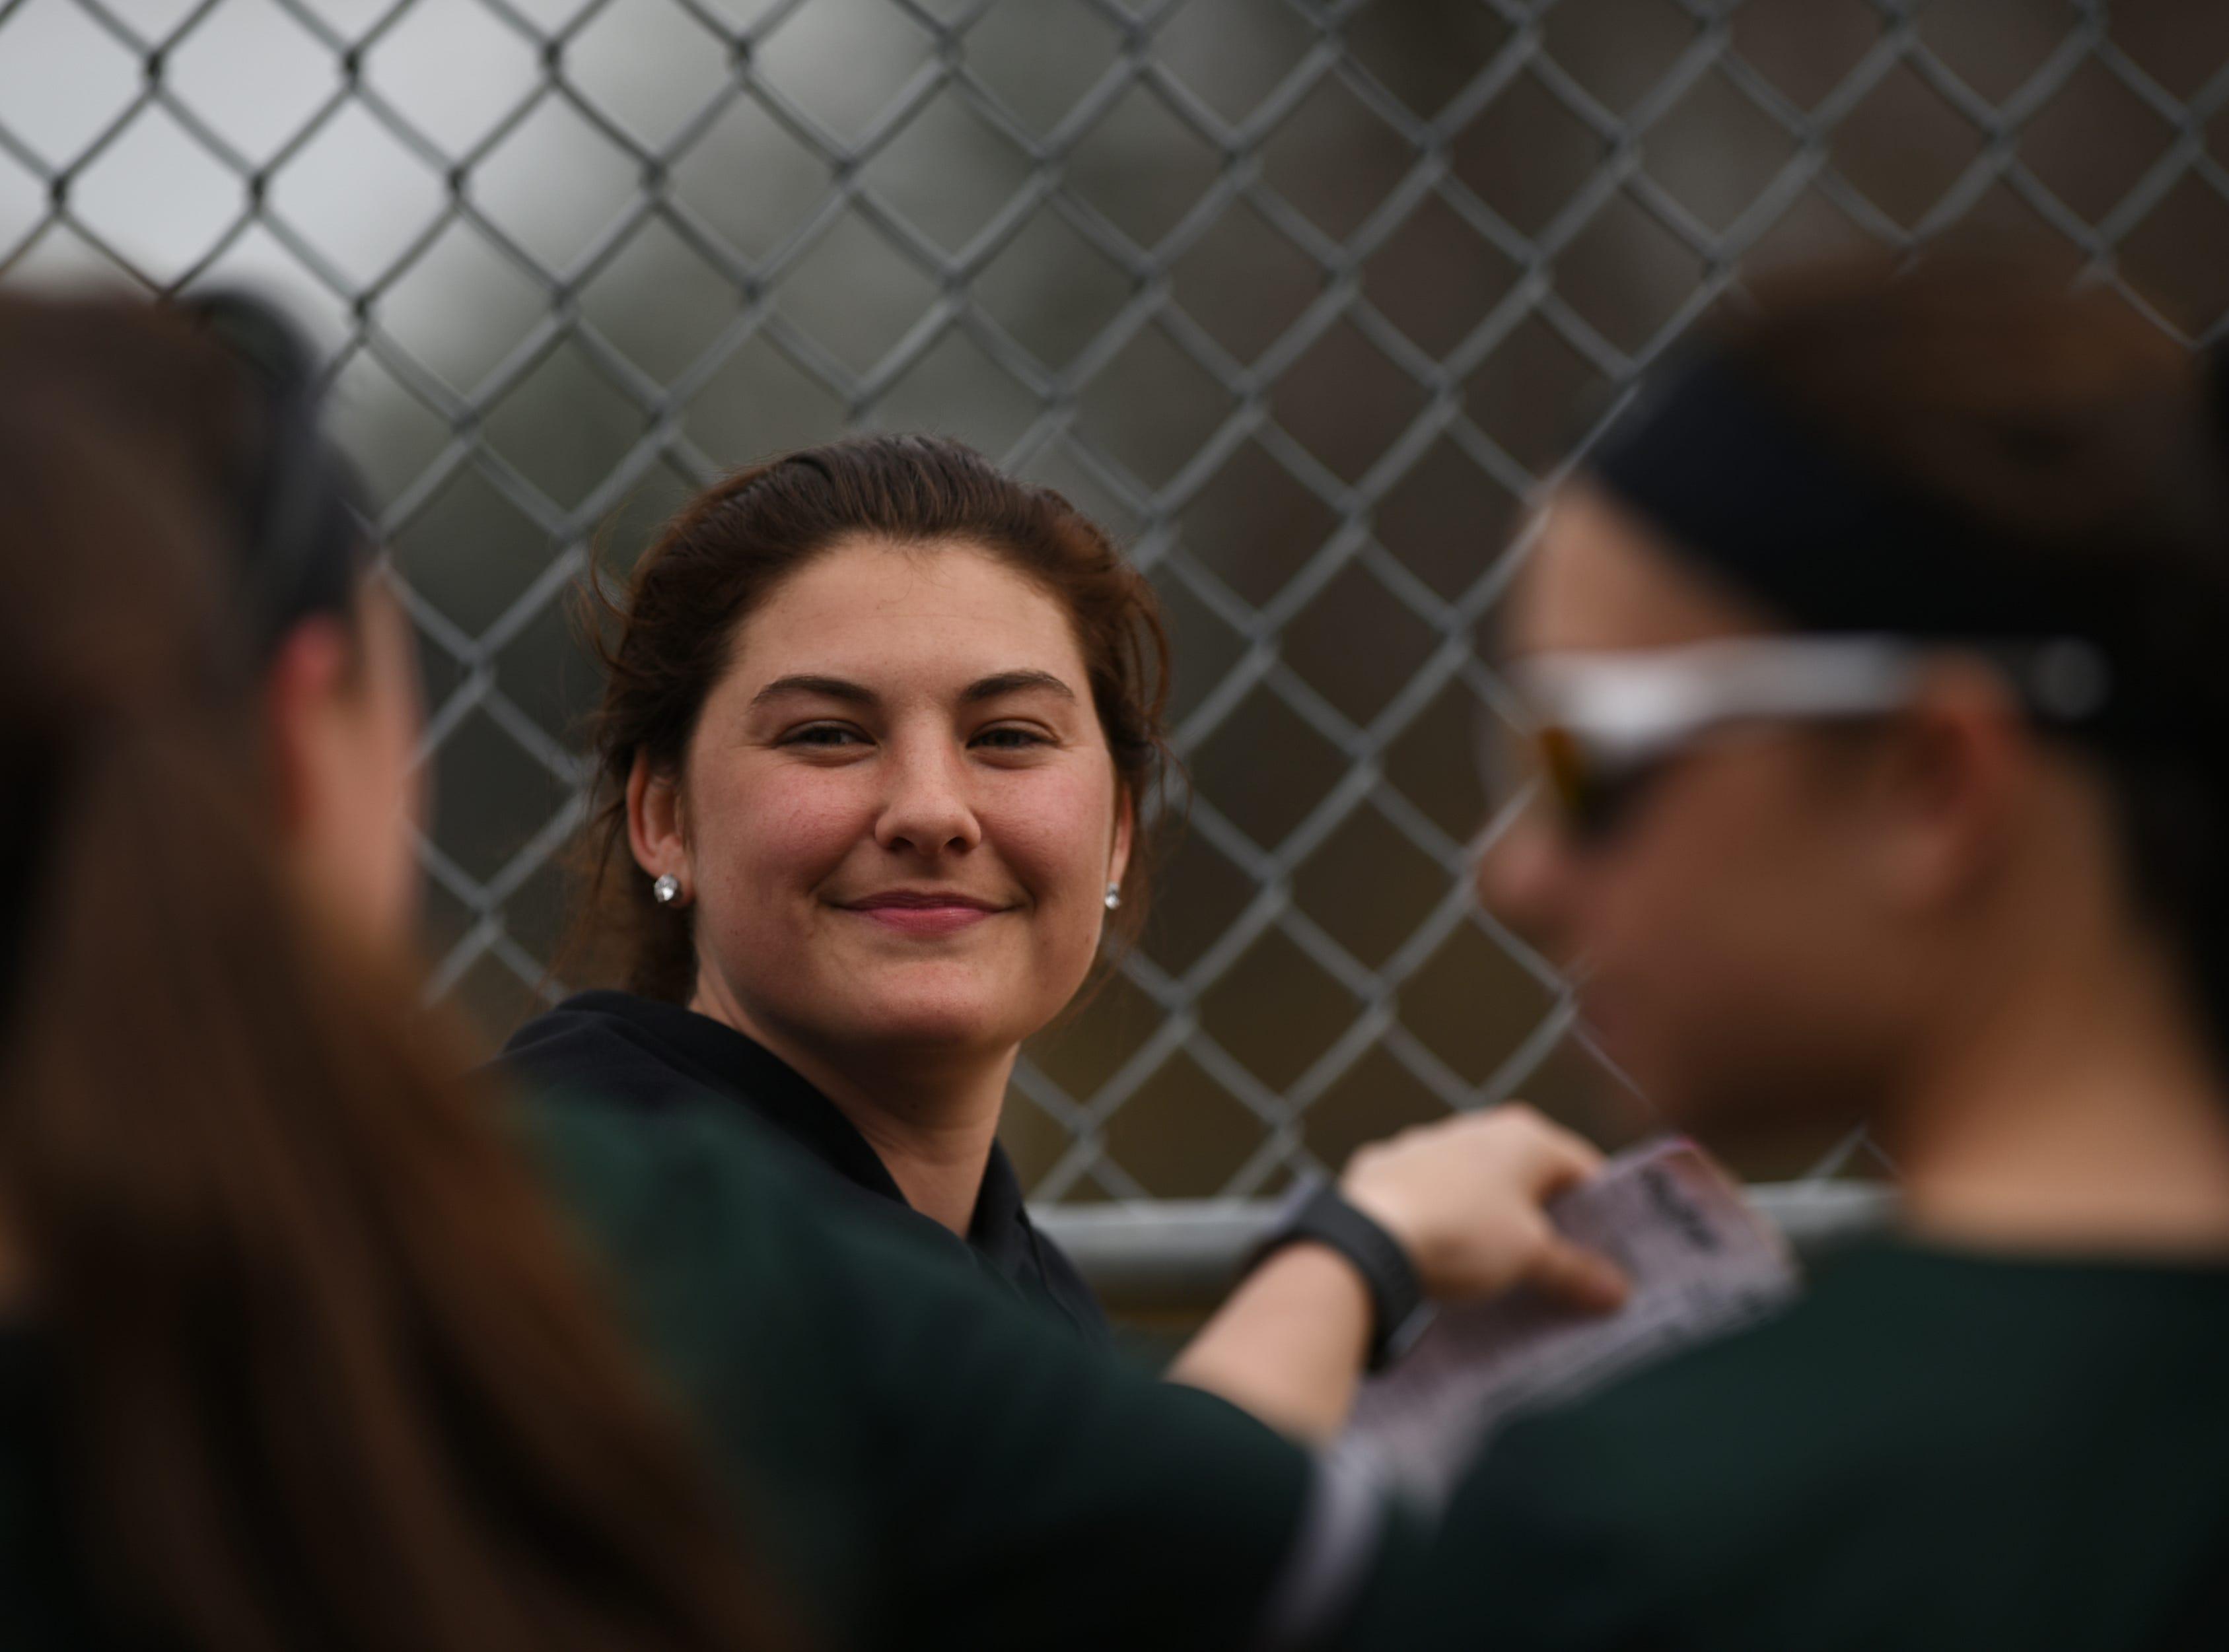 Pequannock at Kinnelon softball game in Kinnelon on Friday April 12, 2019. Kinnelon coach Marissa Bariso smiles during the game.